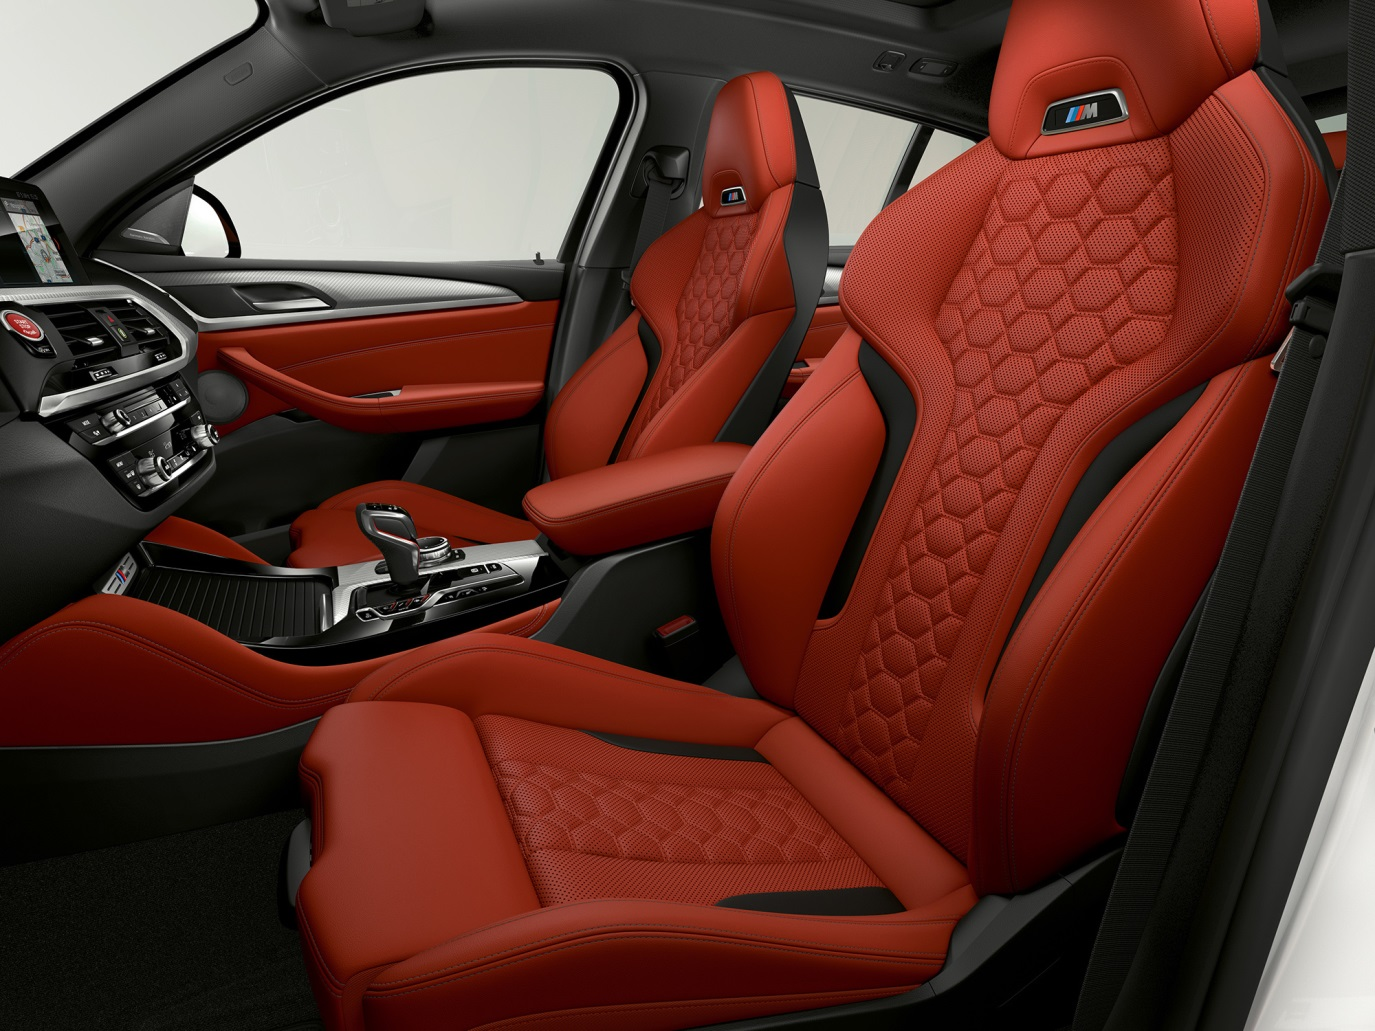 C:\Users\Jialing\Desktop\20190306\20190306\635-Car Guide\bmw-full\5c63bd50ec05c4a62b0001b4.jpg